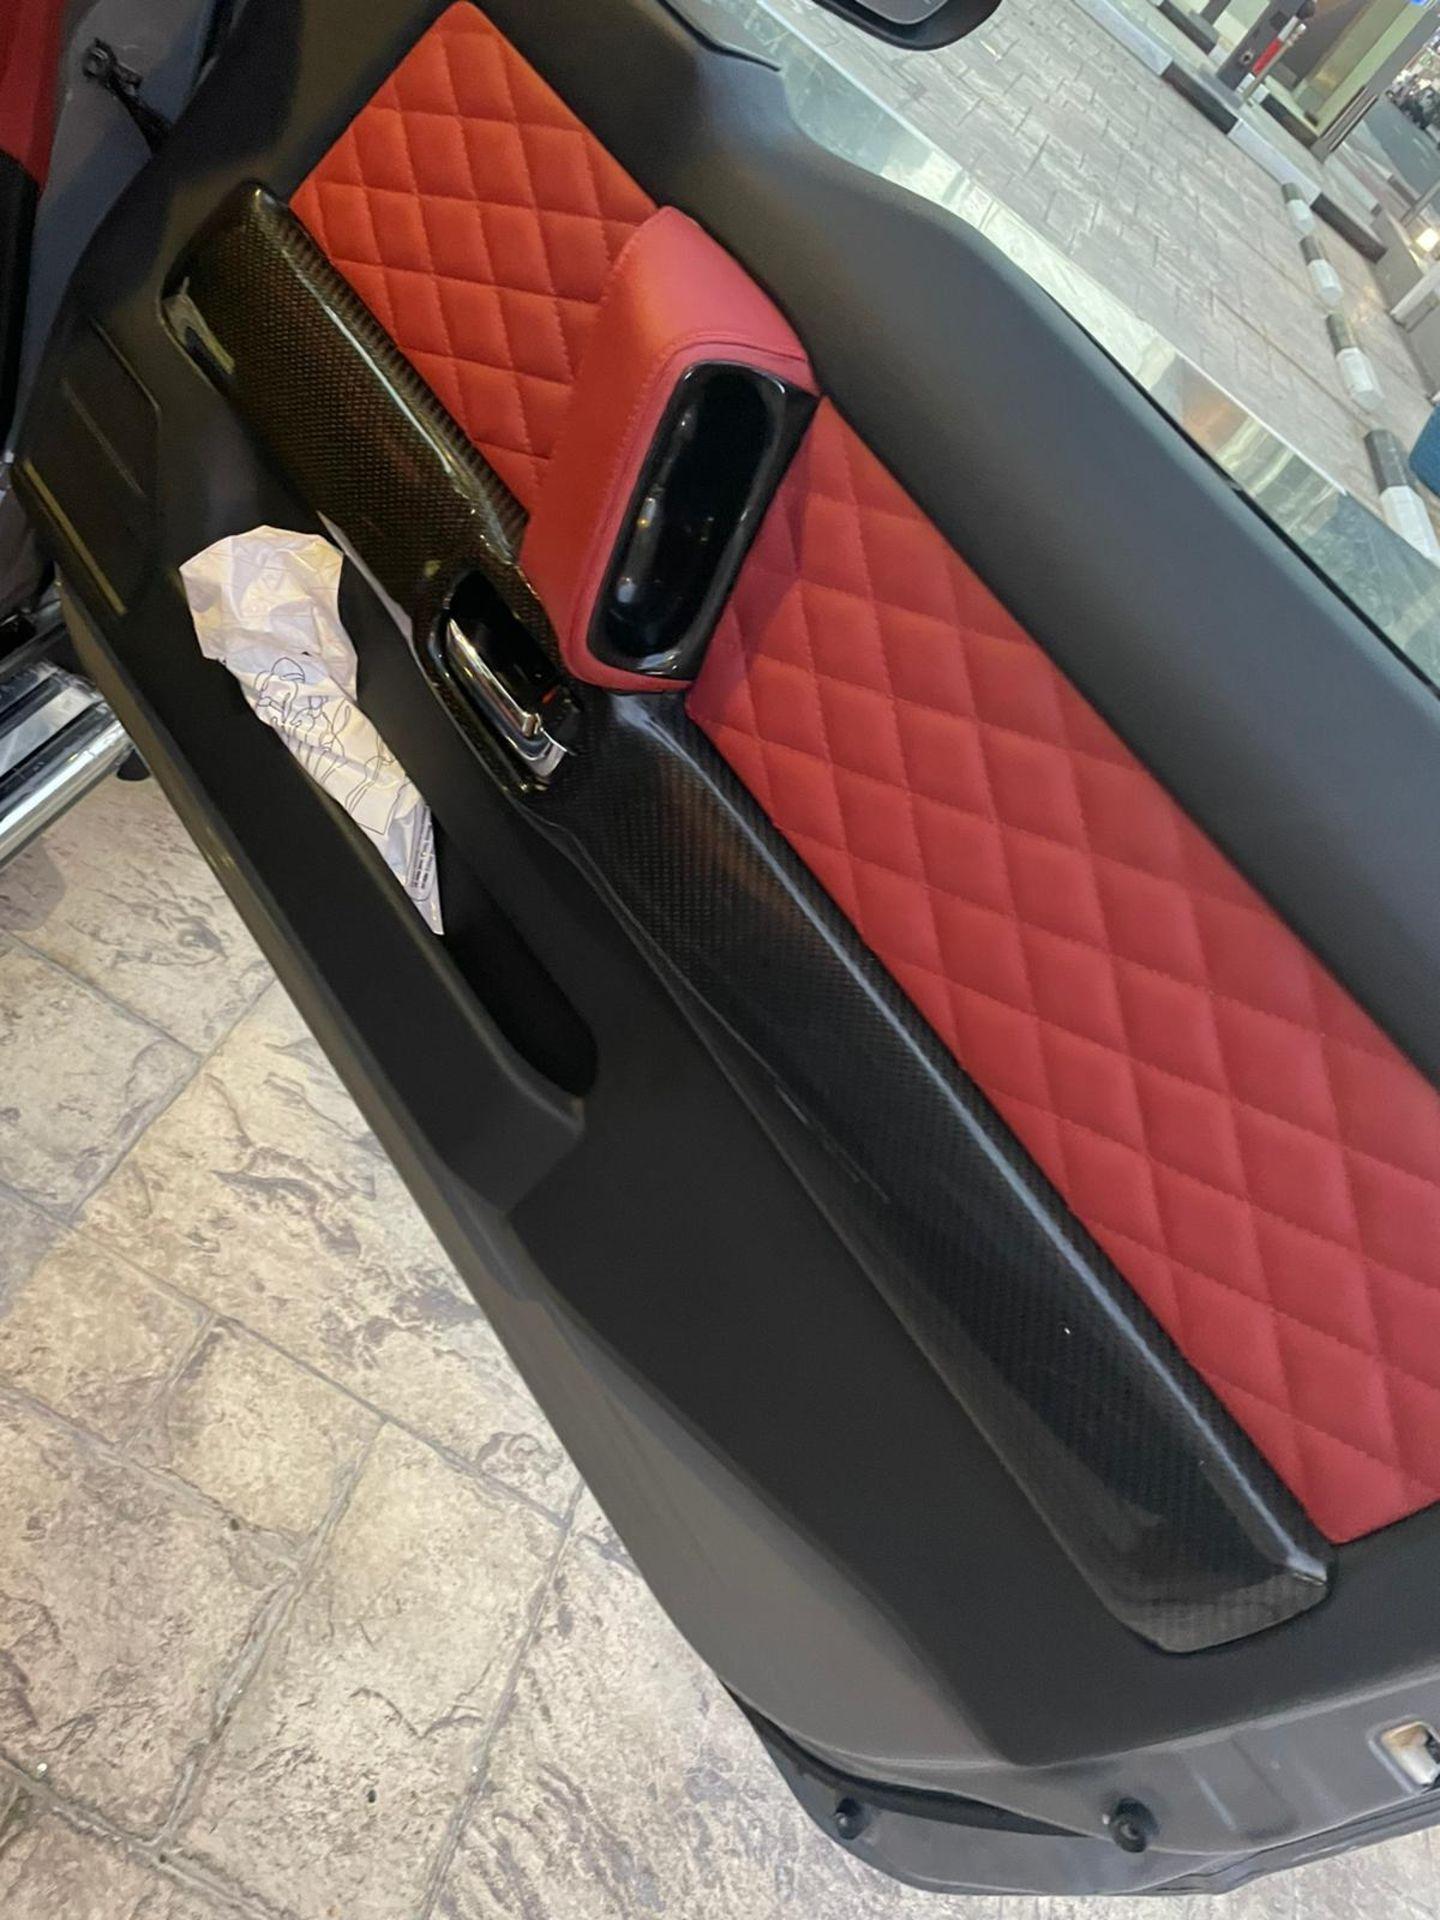 *RESERVE MET* - 2019 Suzuki Jimny Converted to Mini G - Mini Mercedes G Wagon G63 Brabus. - Image 6 of 6